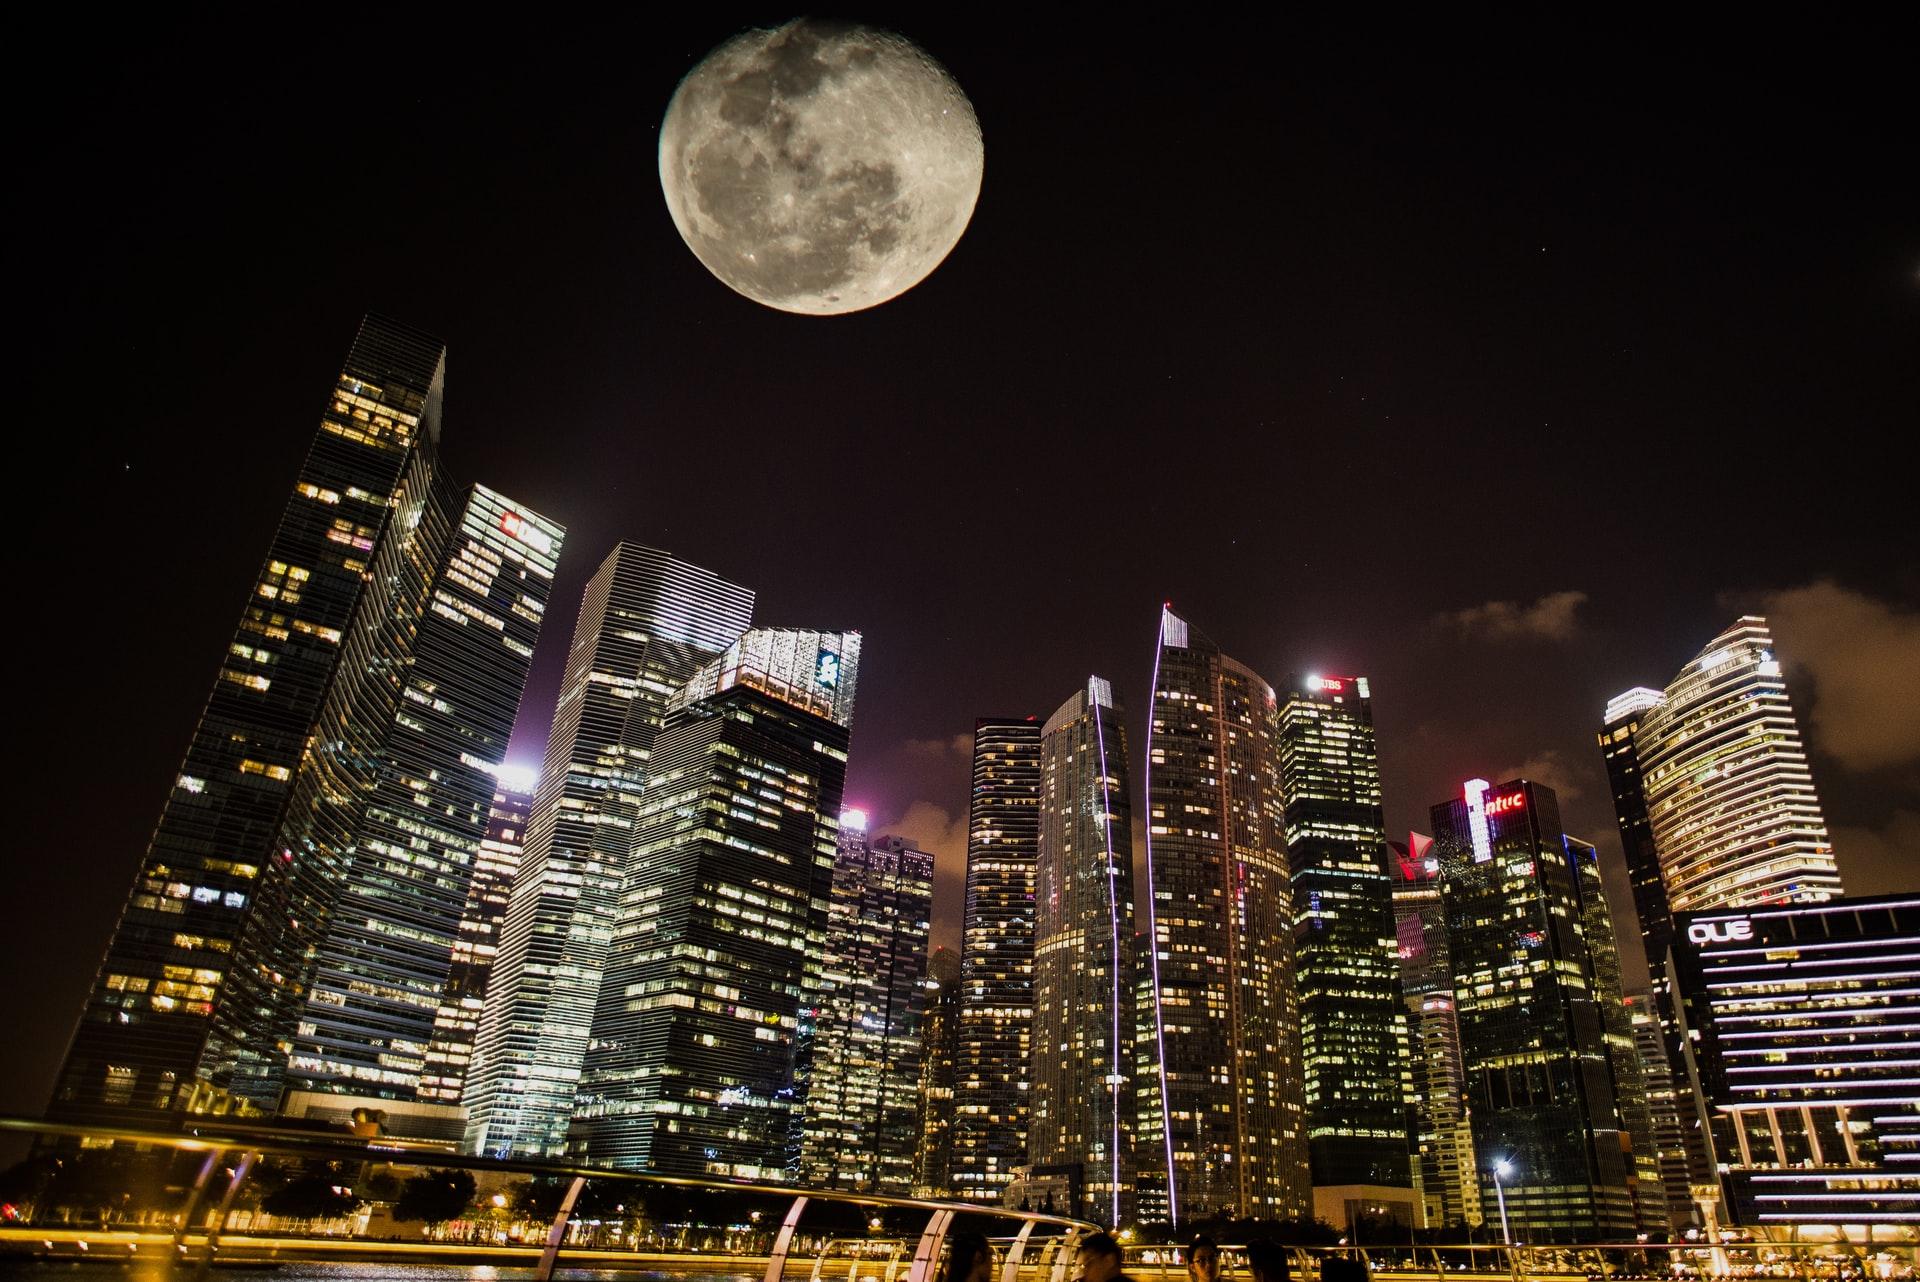 zračenje na mesecu